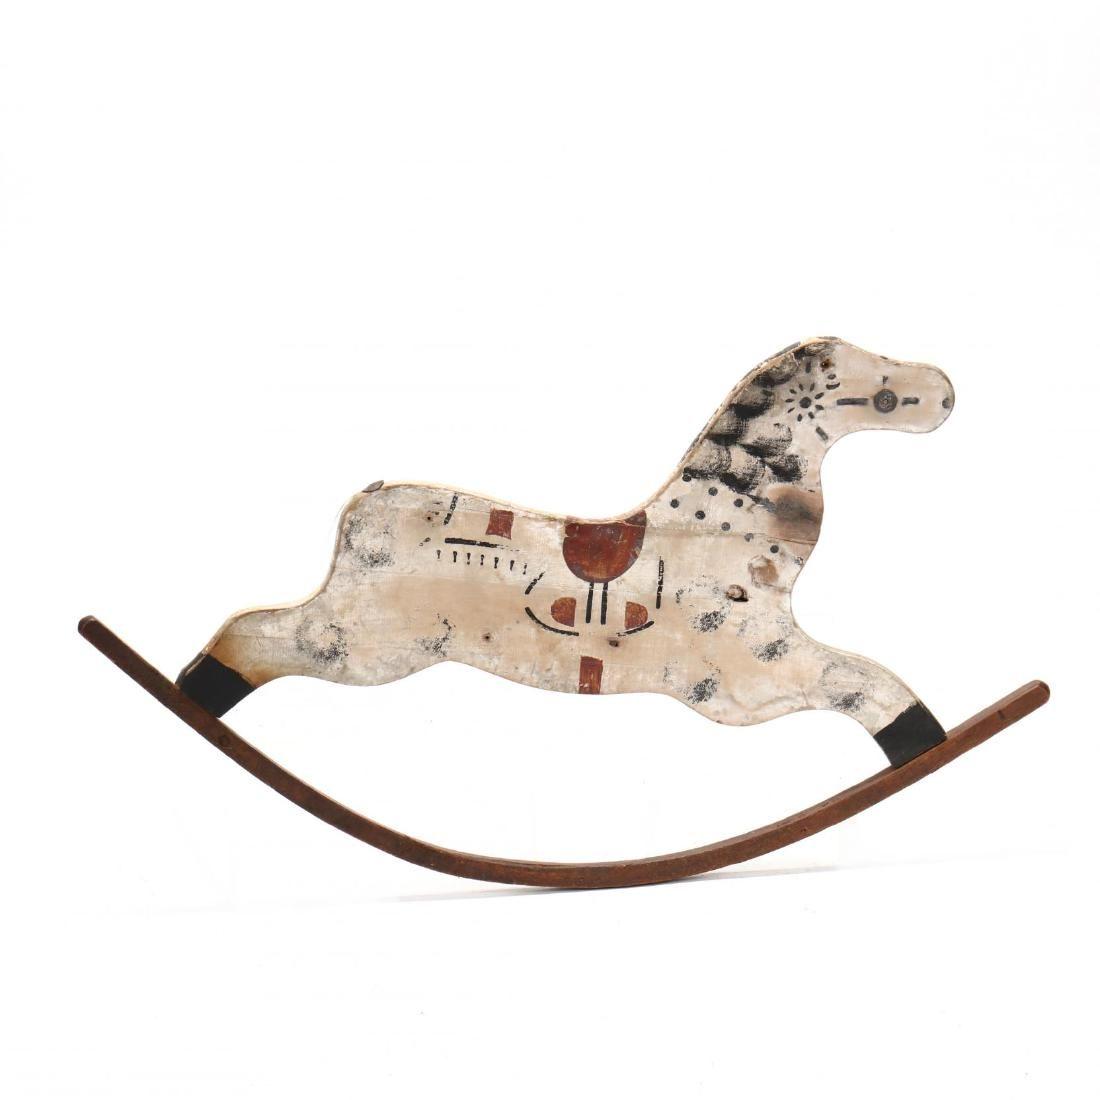 Folk Art Rocking Horse Trade Sign